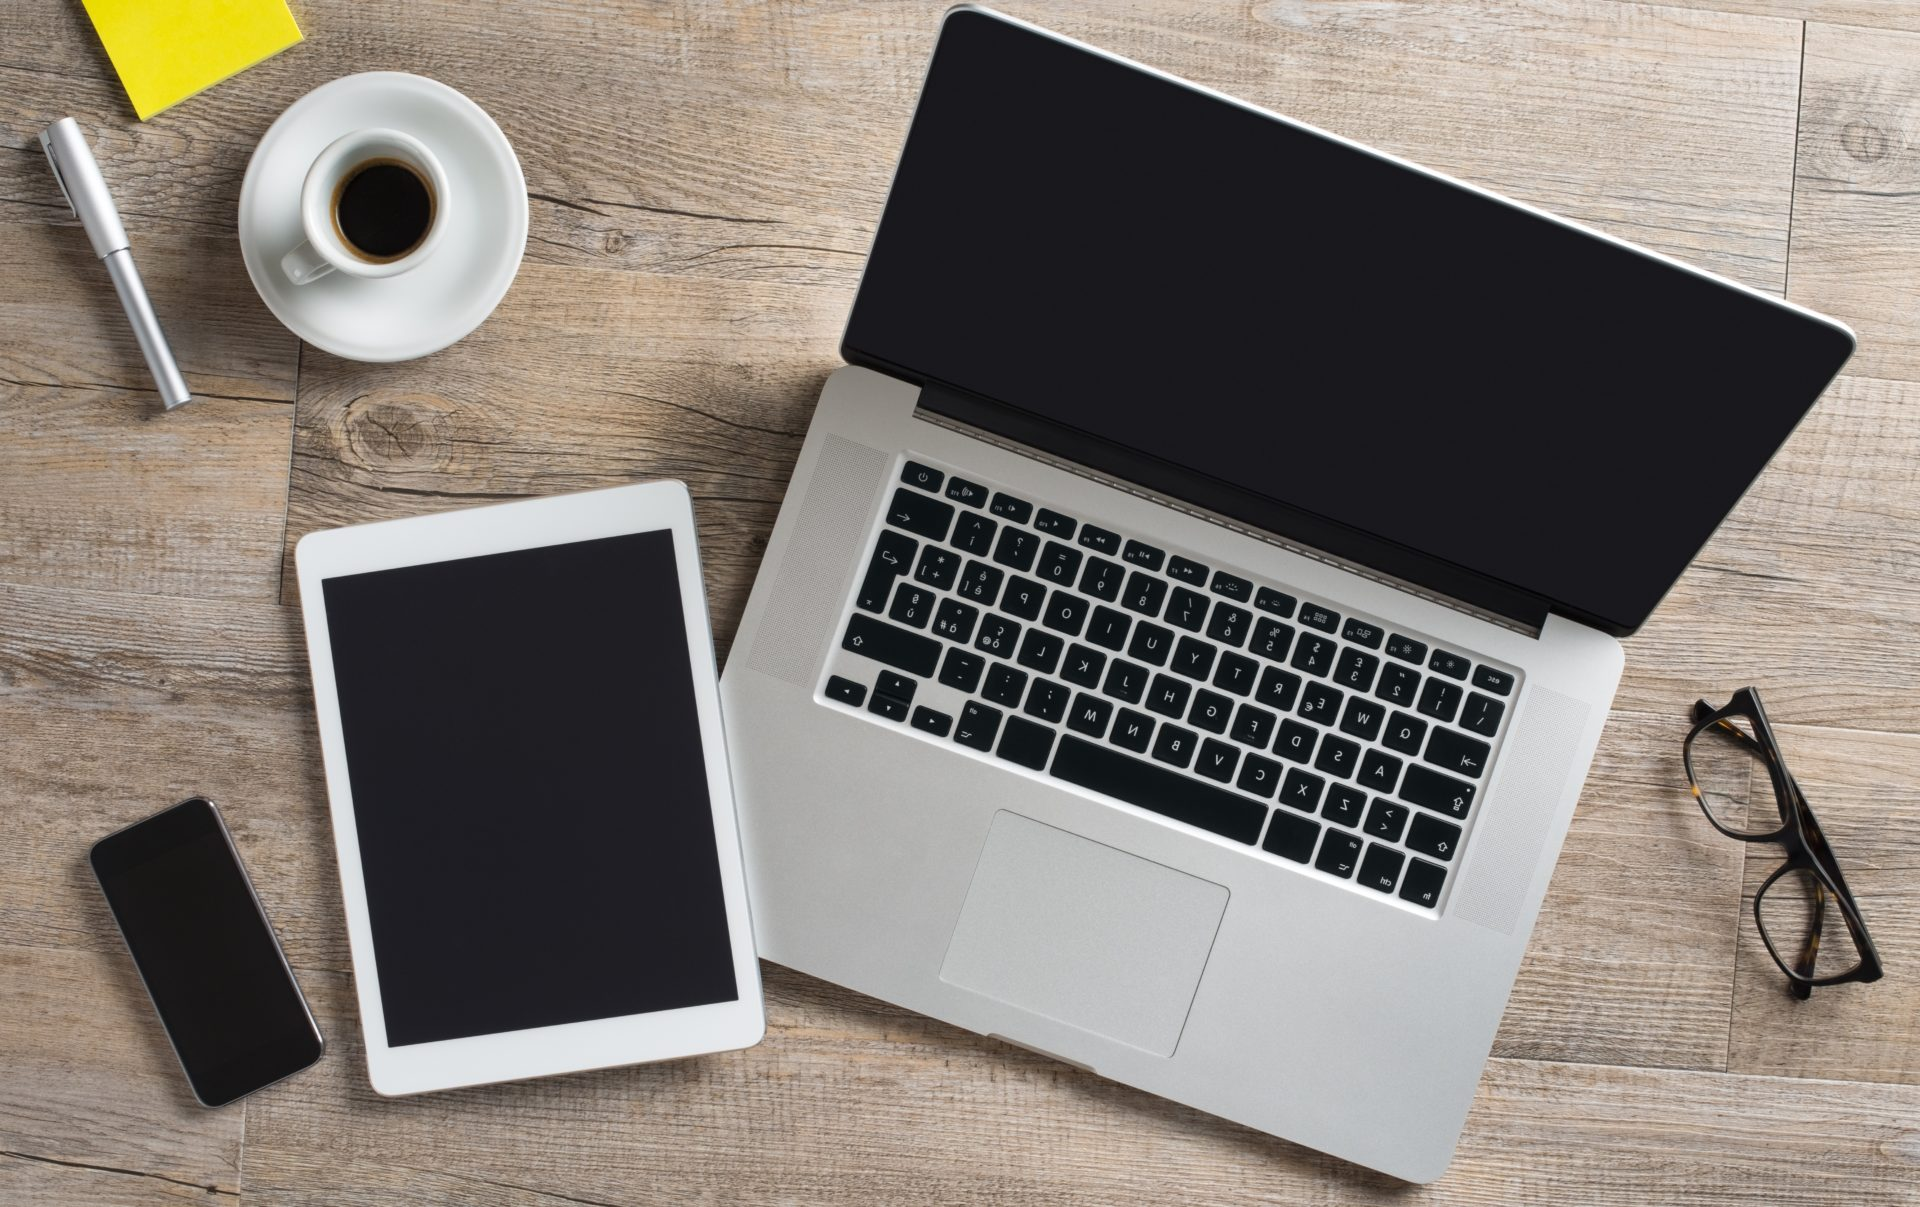 recurso-apple-portatil-mac-iphone-ipad-bbva